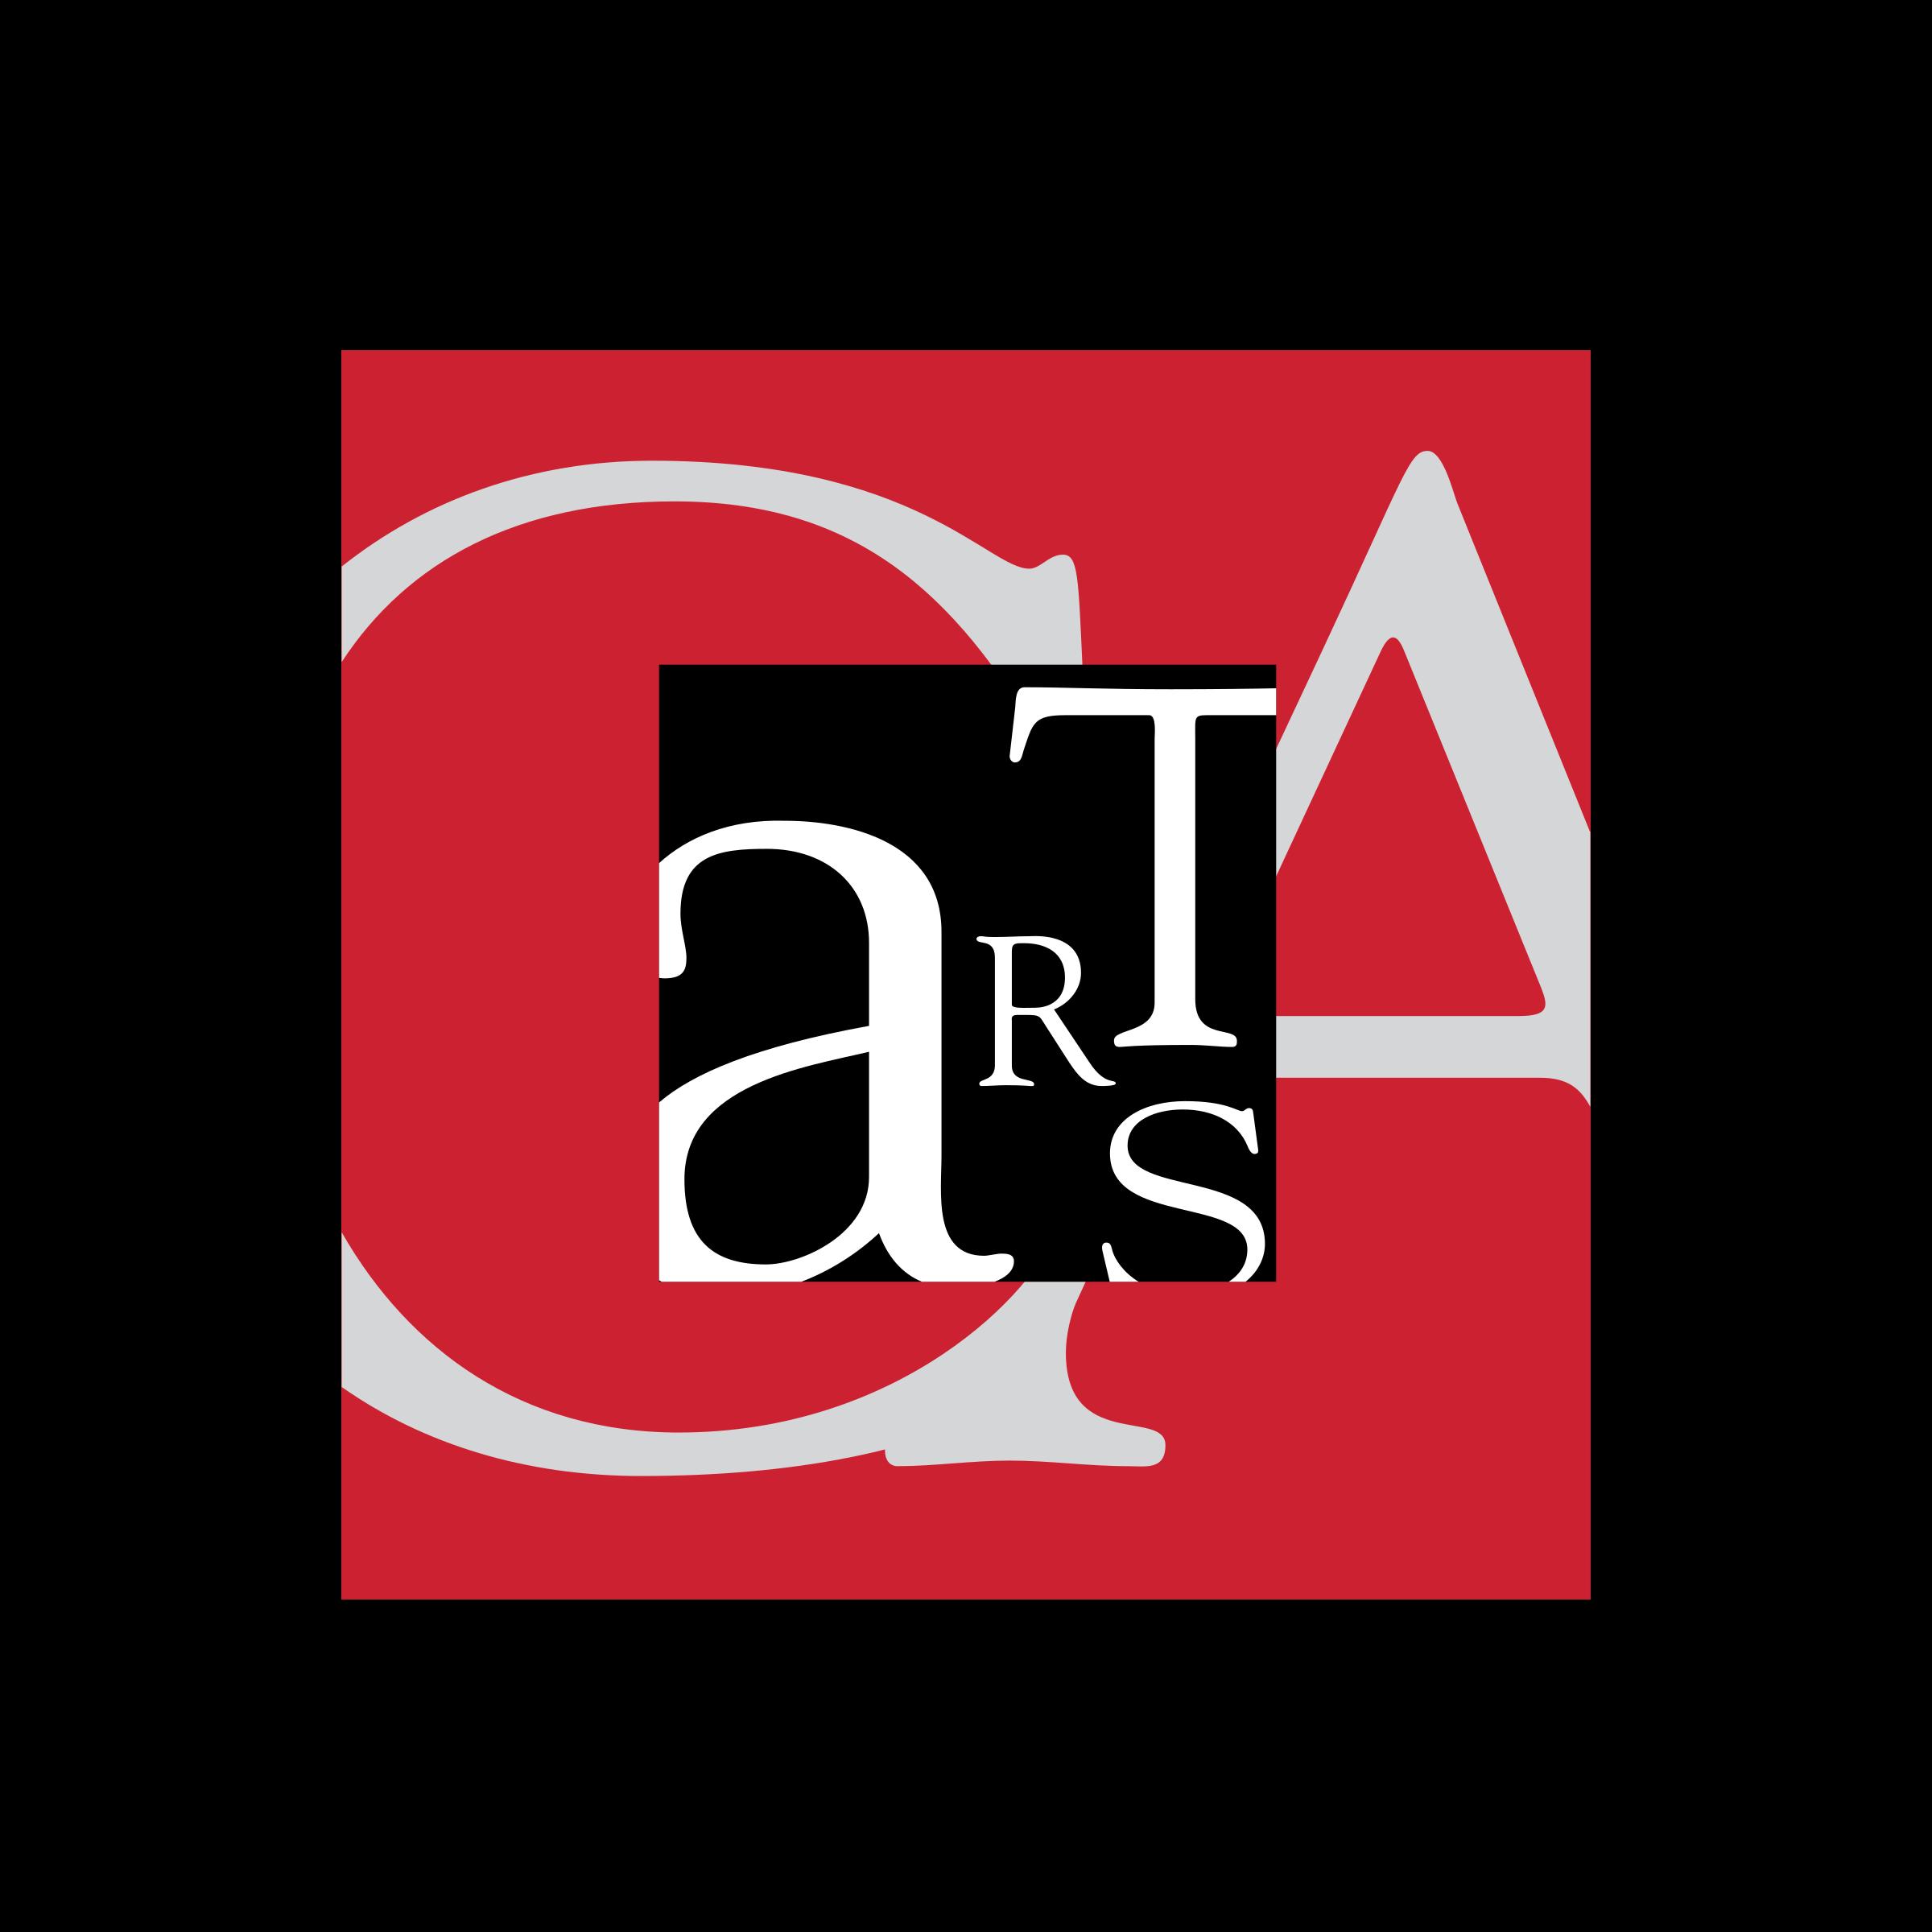 california-arts-council-logo-png-transparent.png